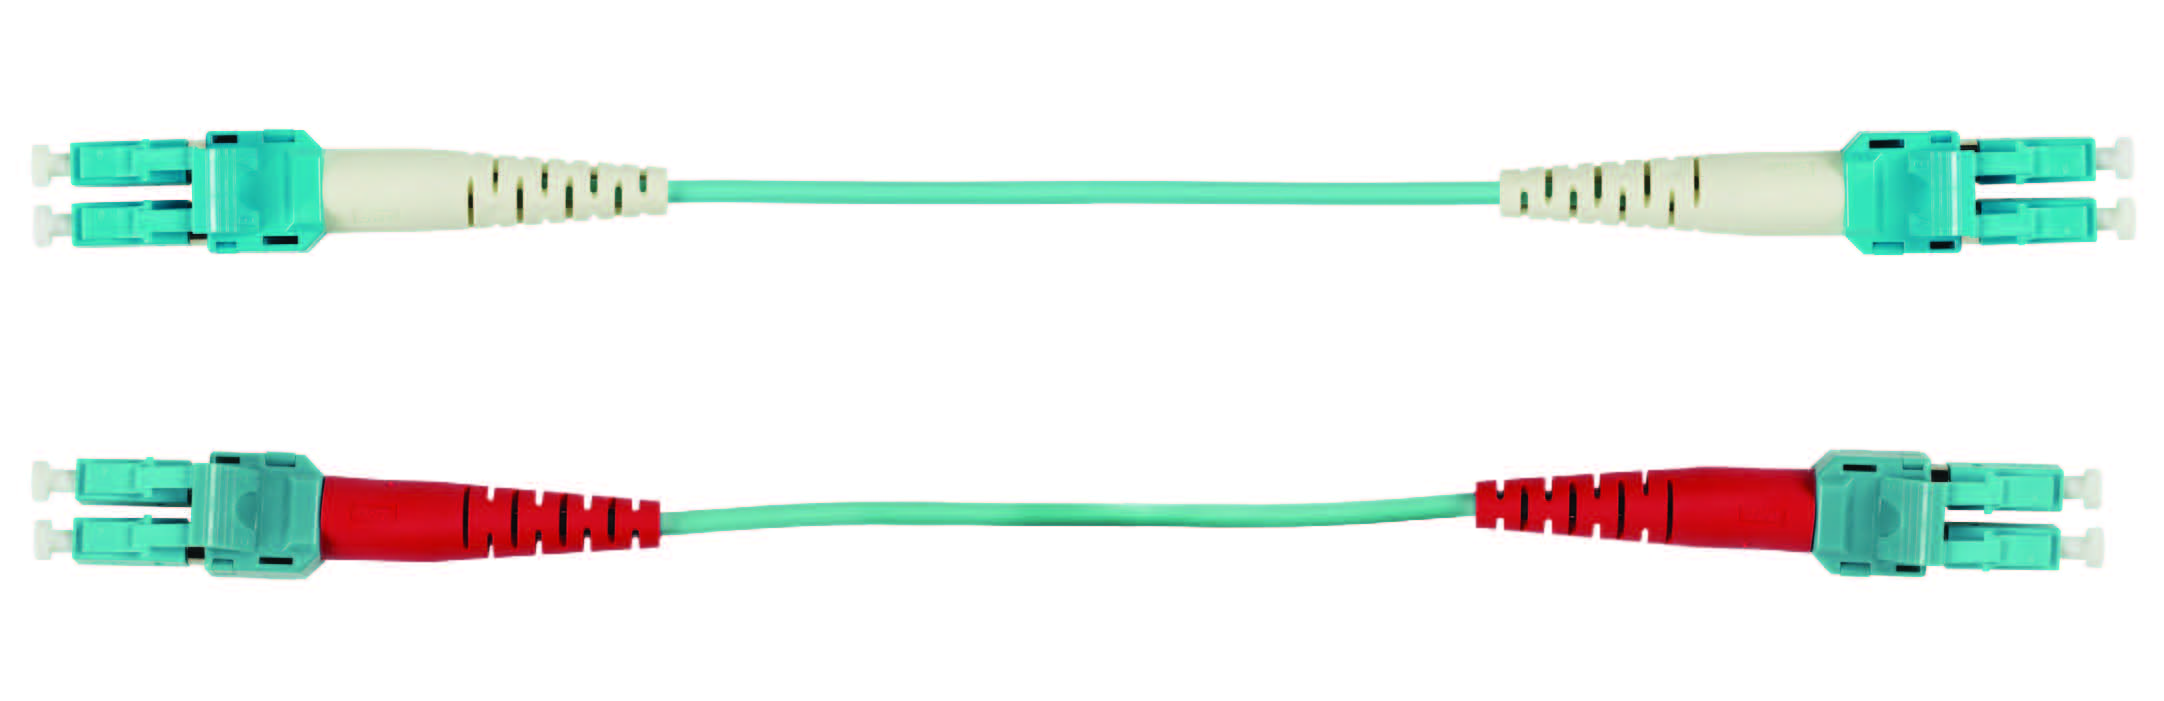 Fiber-Patch-Cords-2